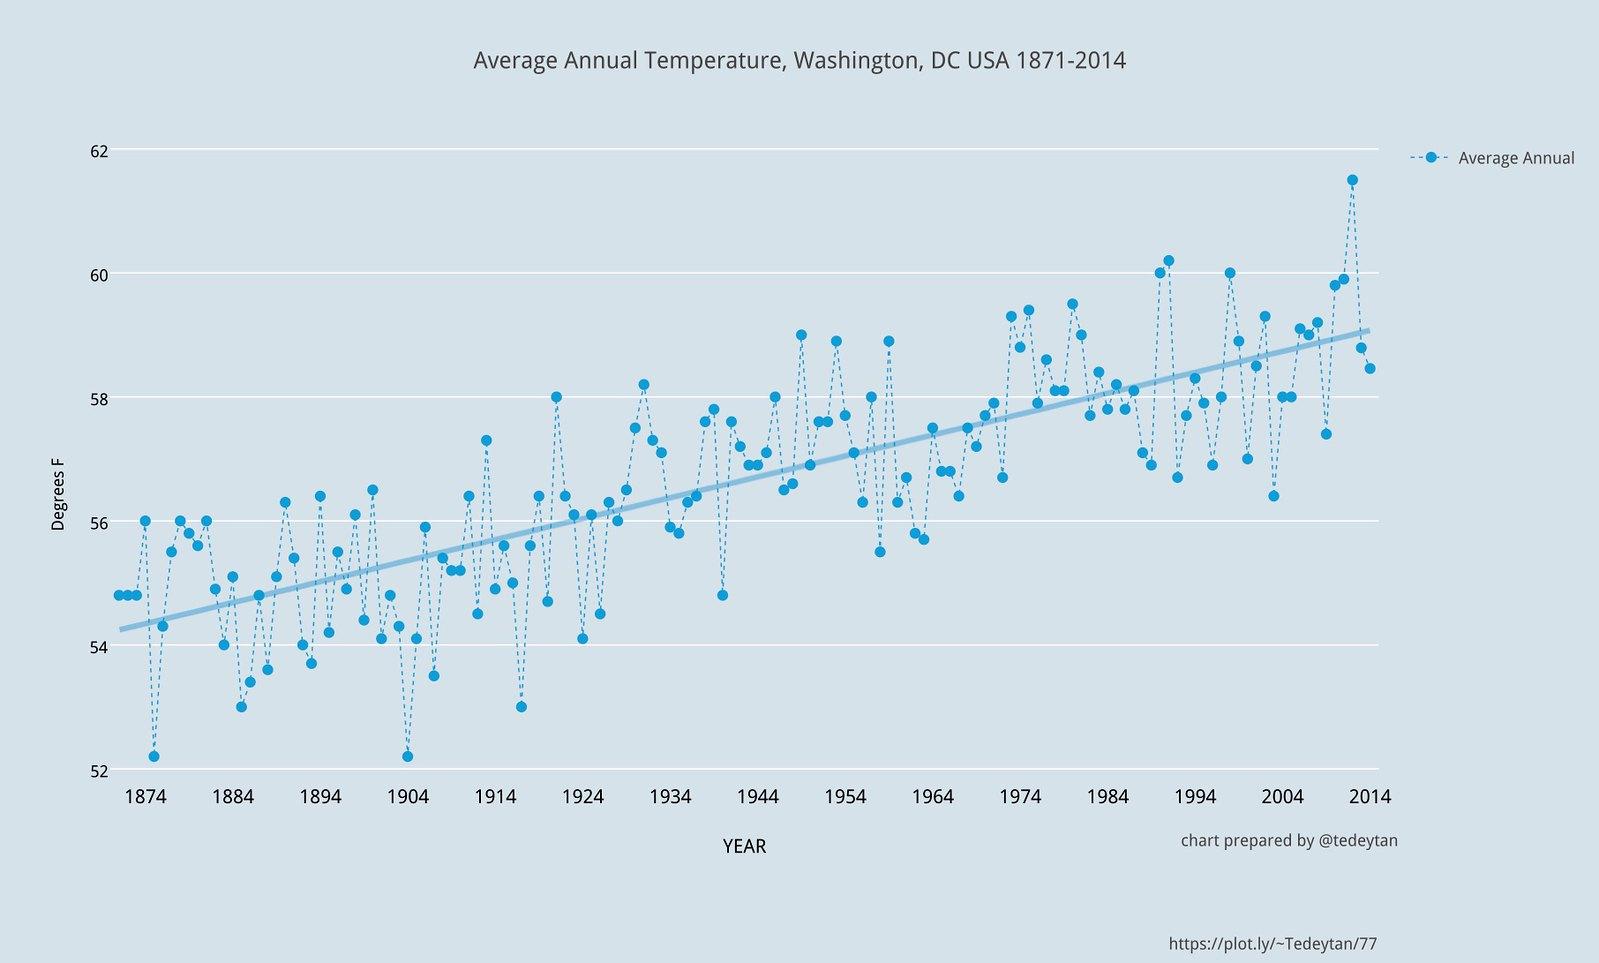 Changing Climate (chart), Washington, DC USA 1871-2014